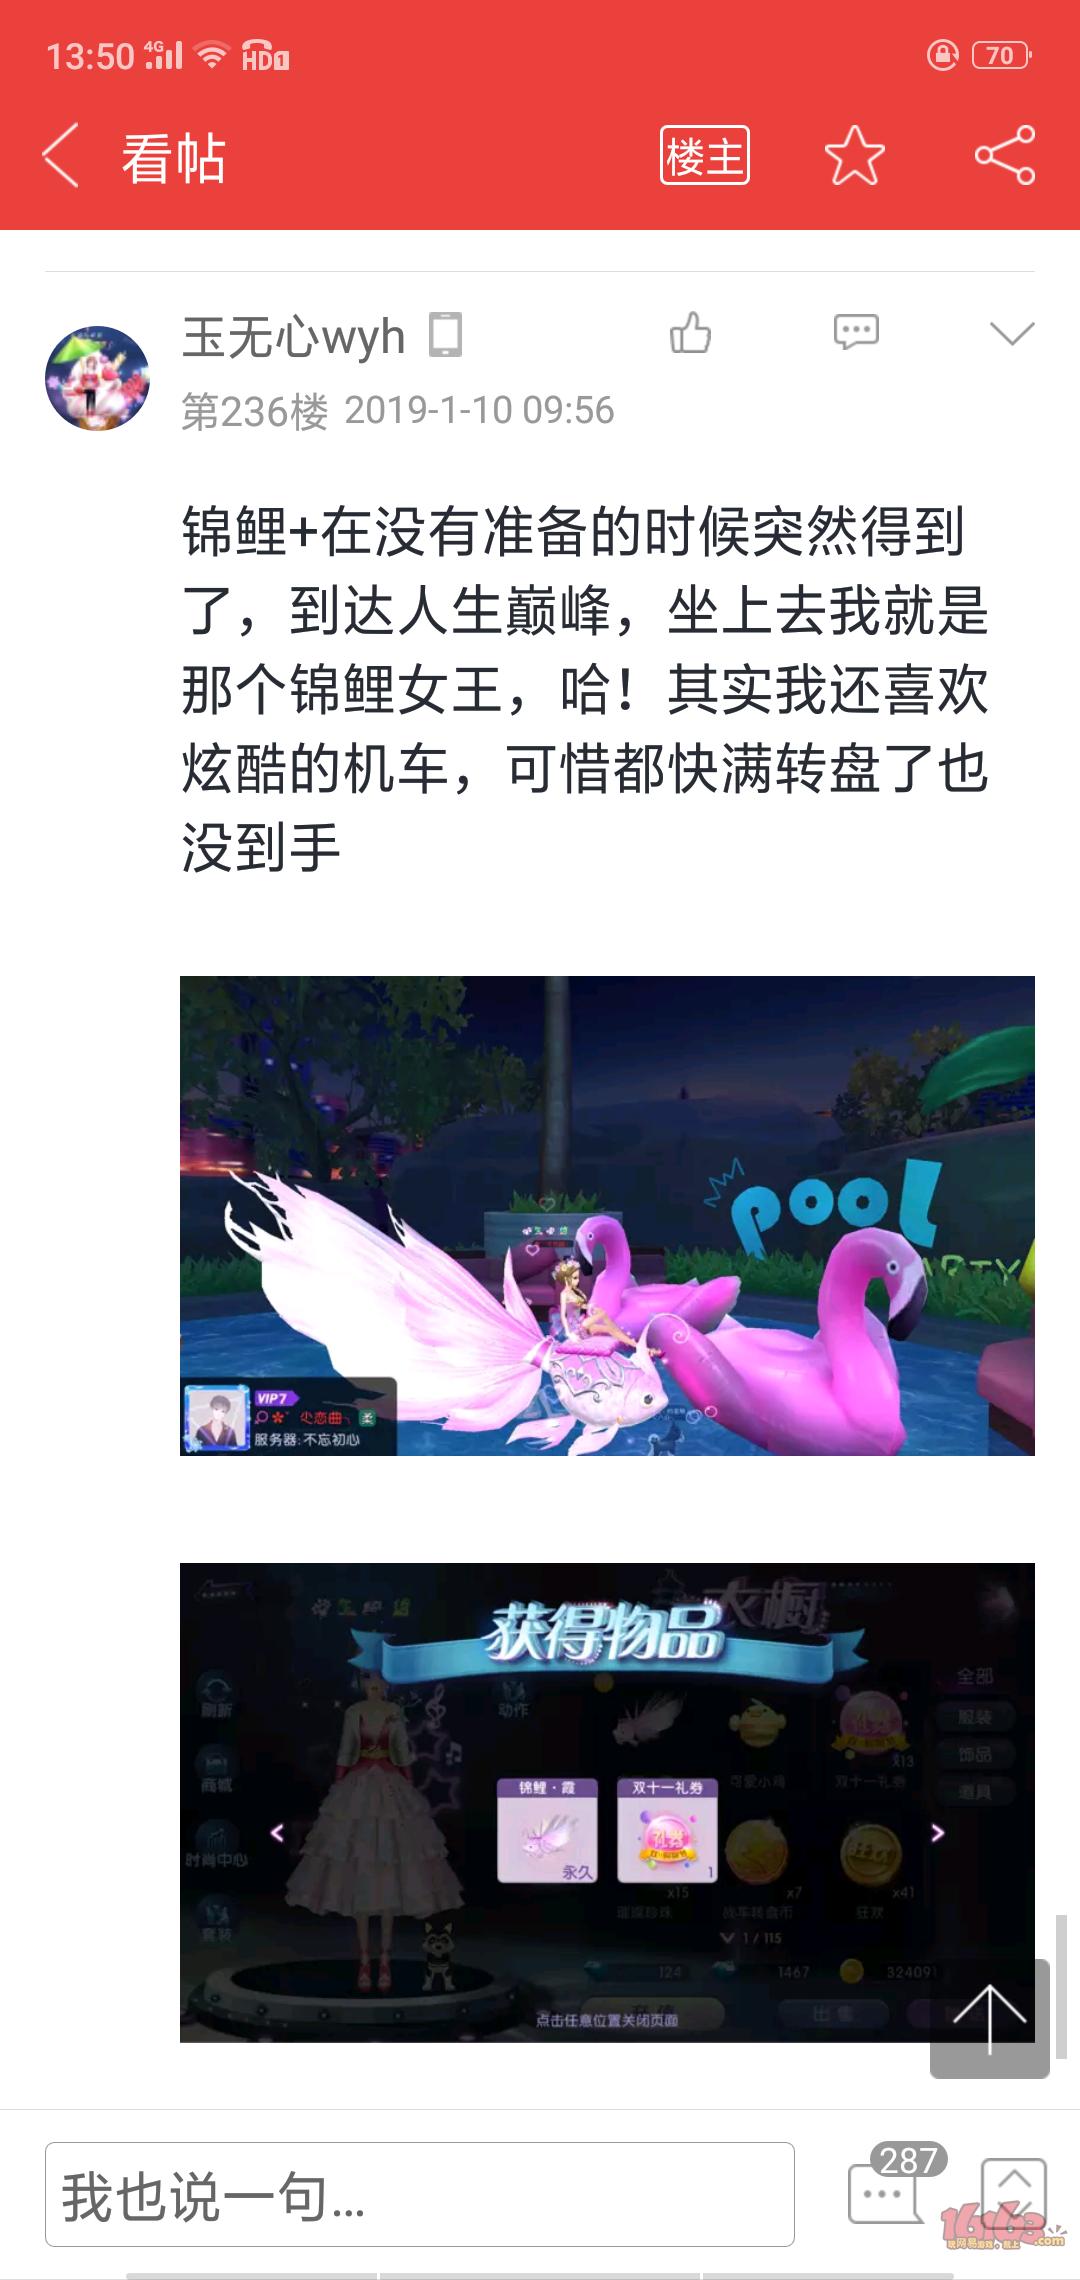 Screenshot_2019-01-11-13-50-31-95.png